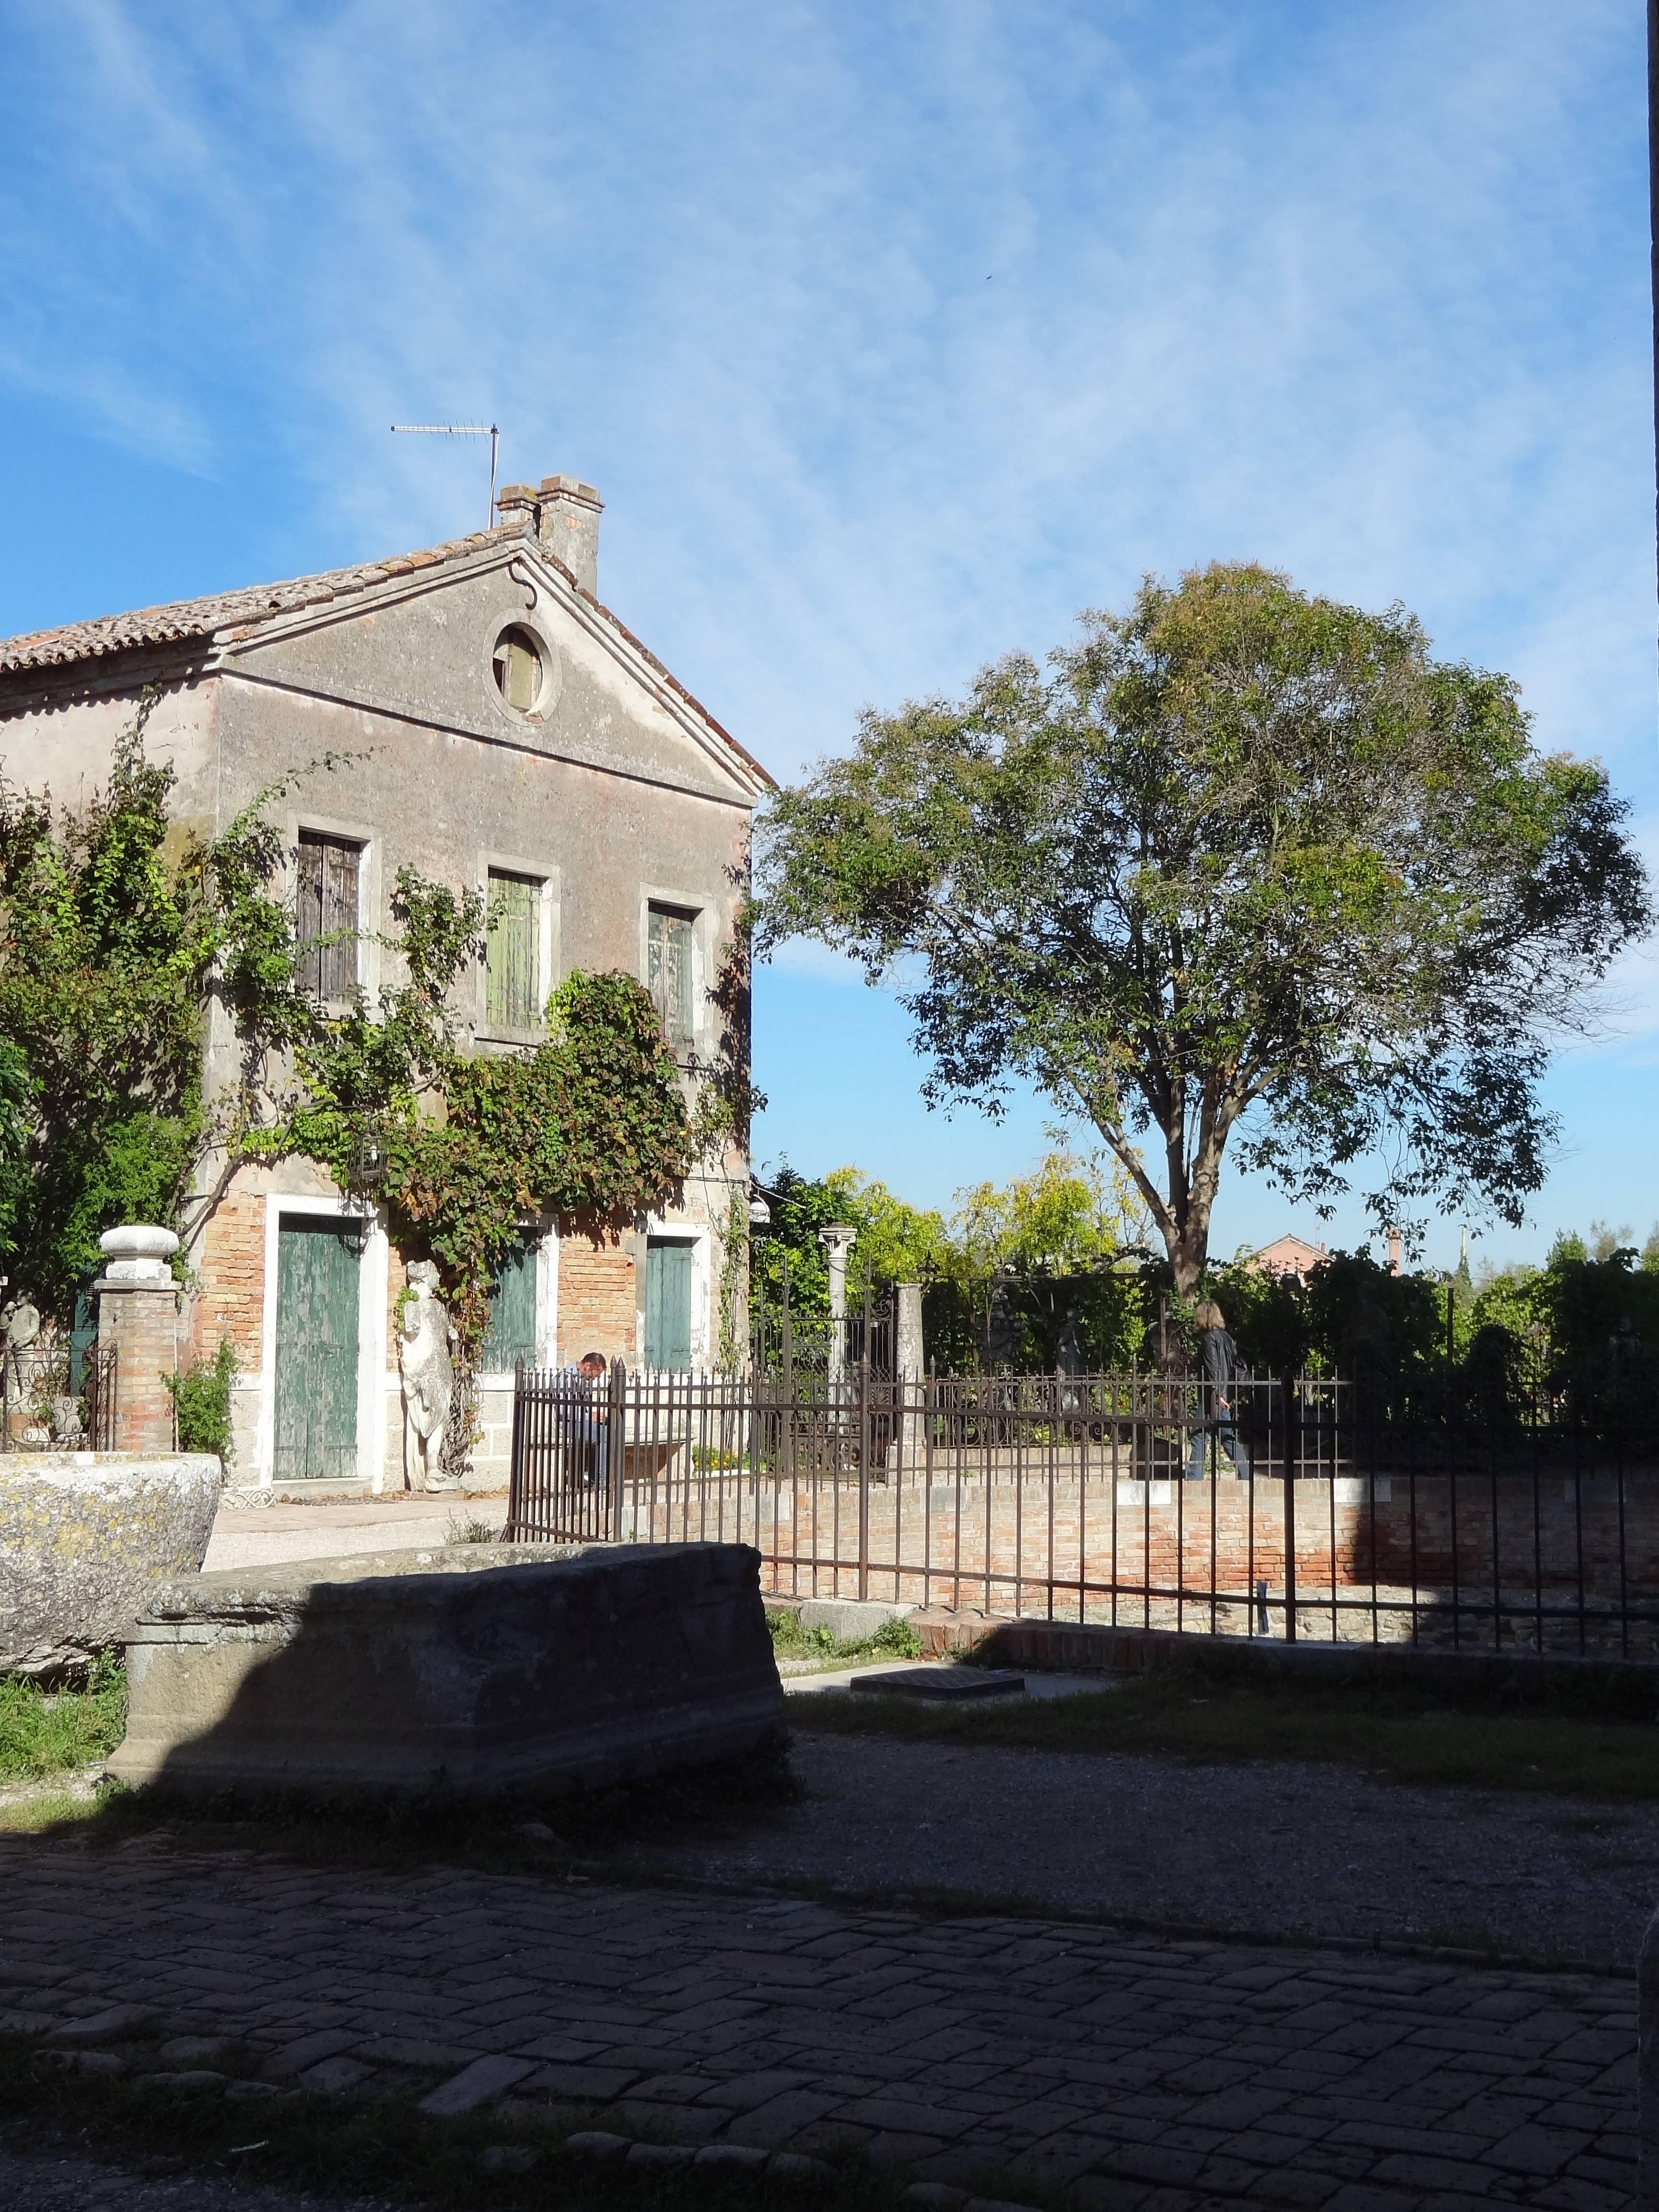 Photo 1: Torcello, île paisible